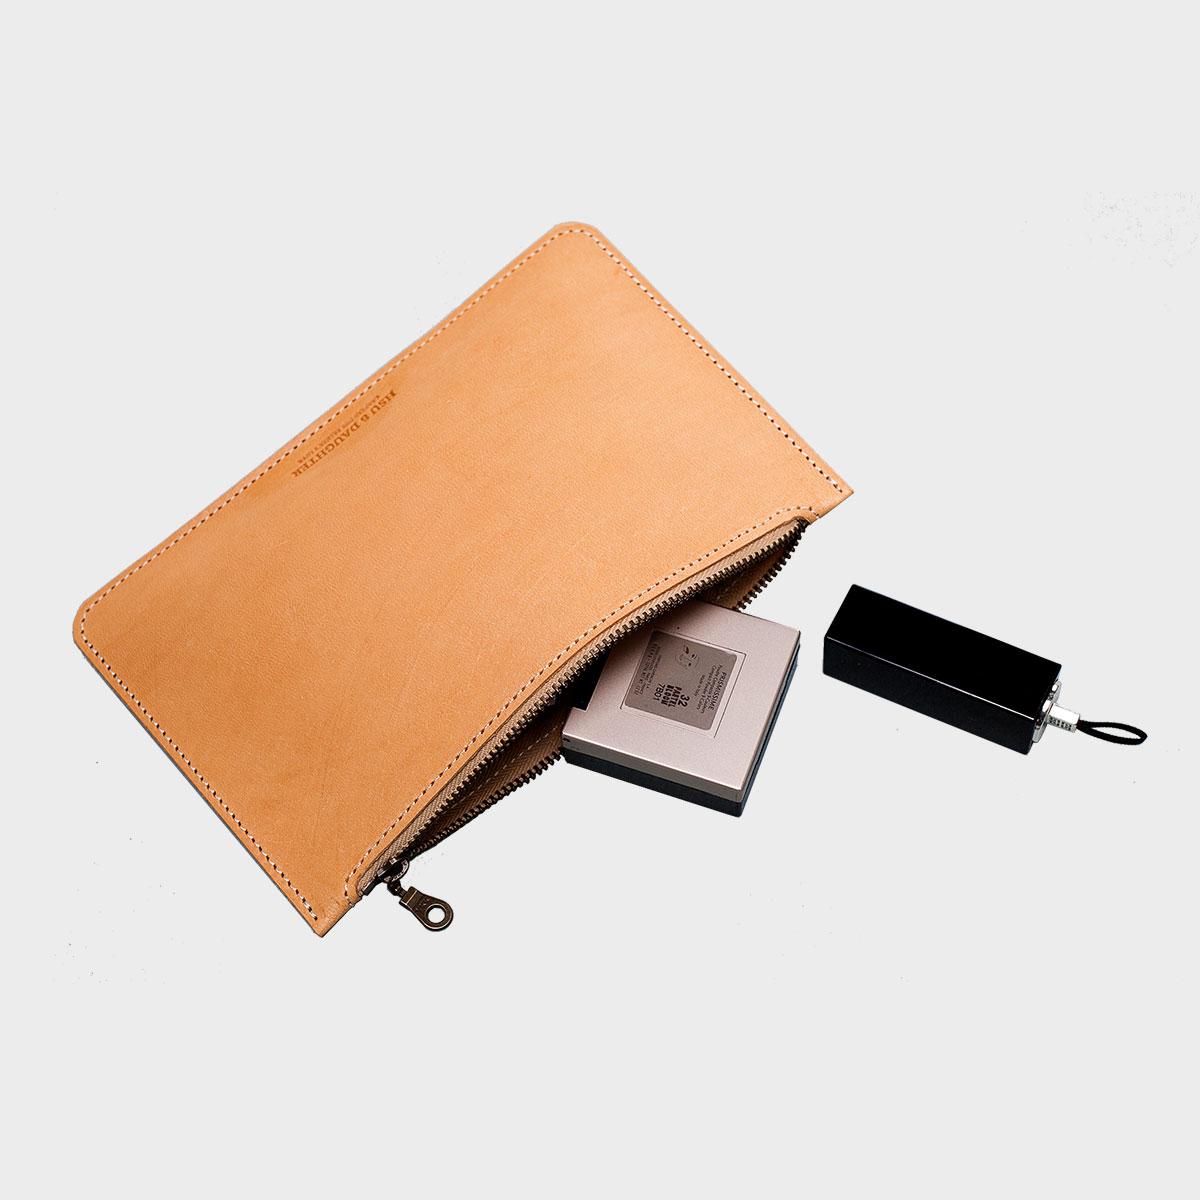 ws-small-storage-bag.jpg